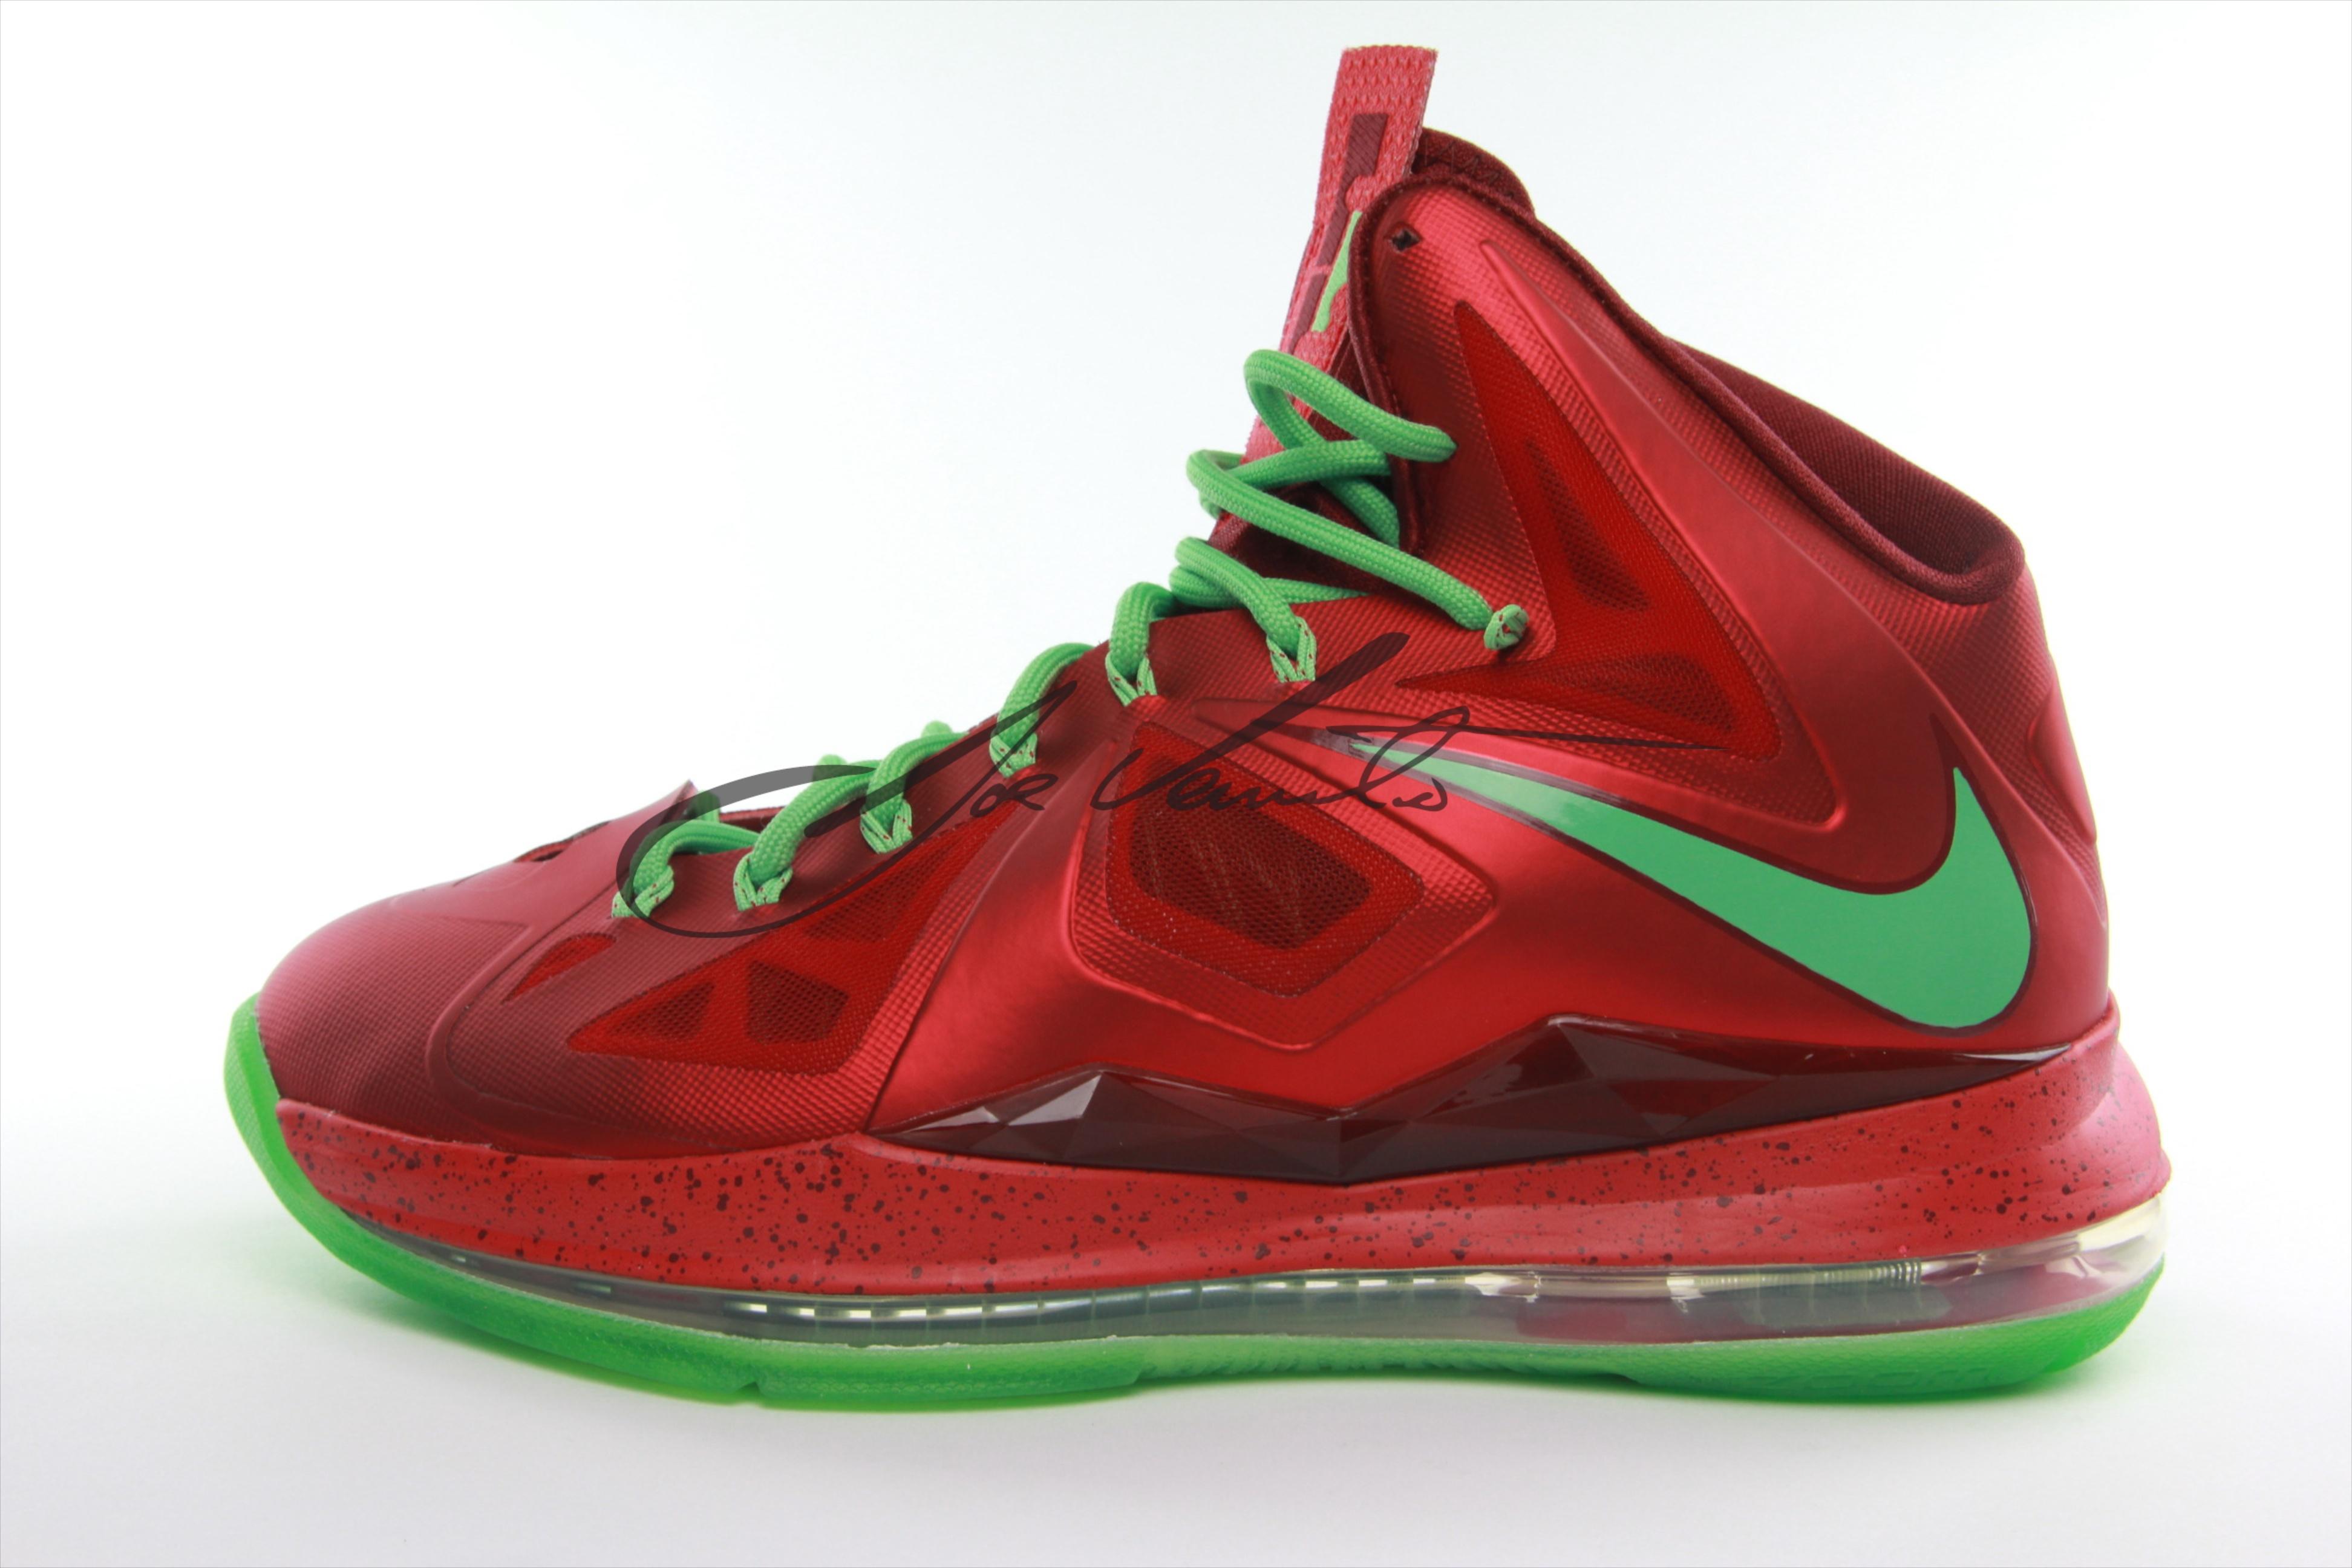 Nike LeBron X (10) 'Christmas' – New Images